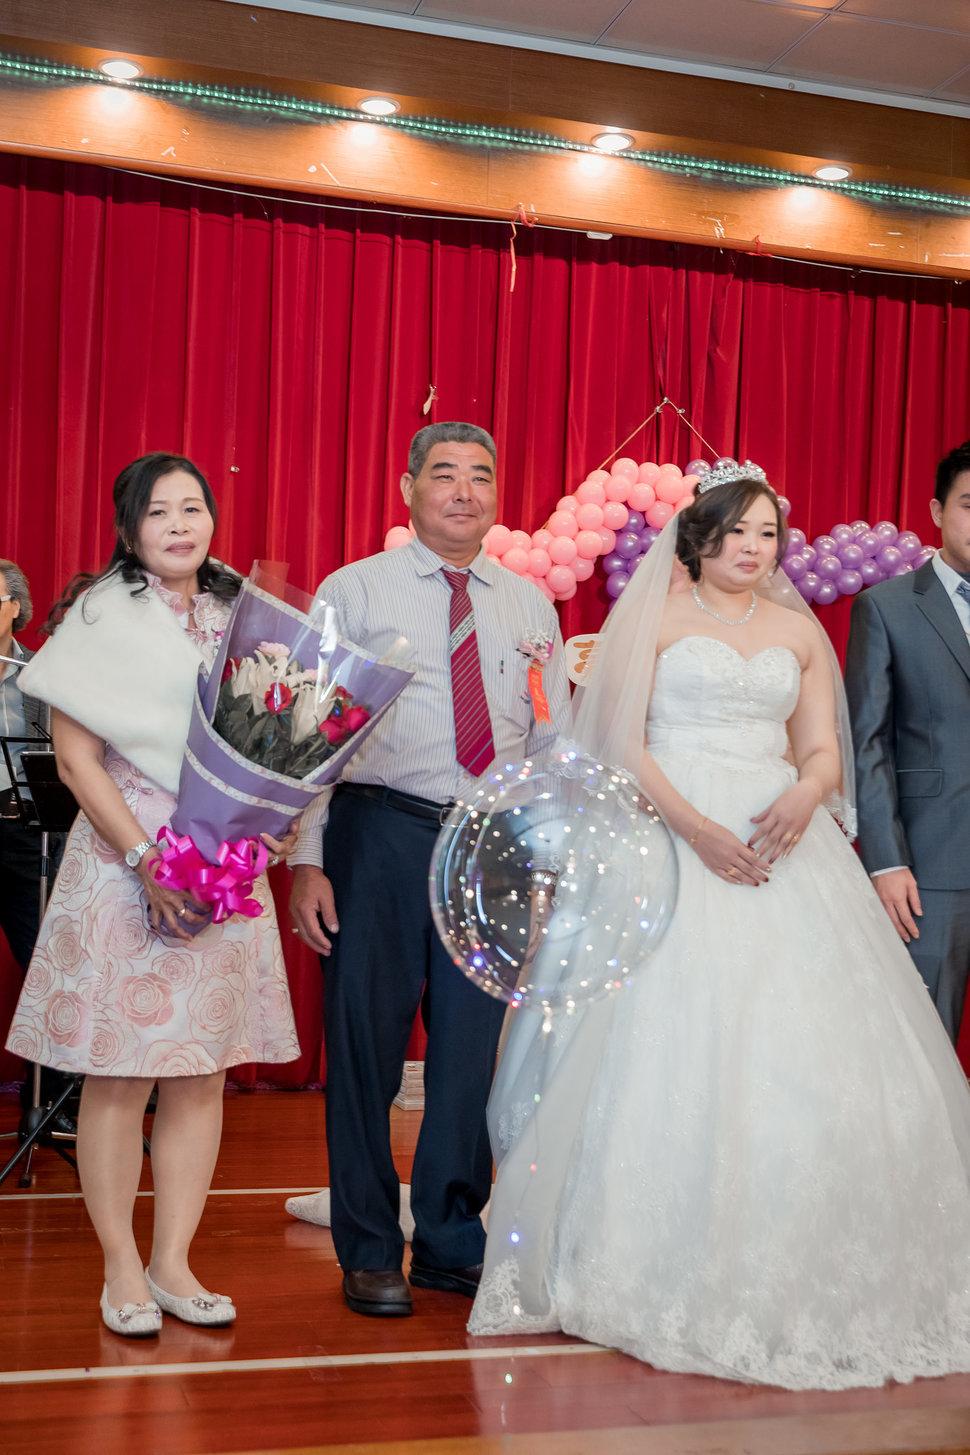 39820651742_6b40ff5dff_k - J Photographer《結婚吧》